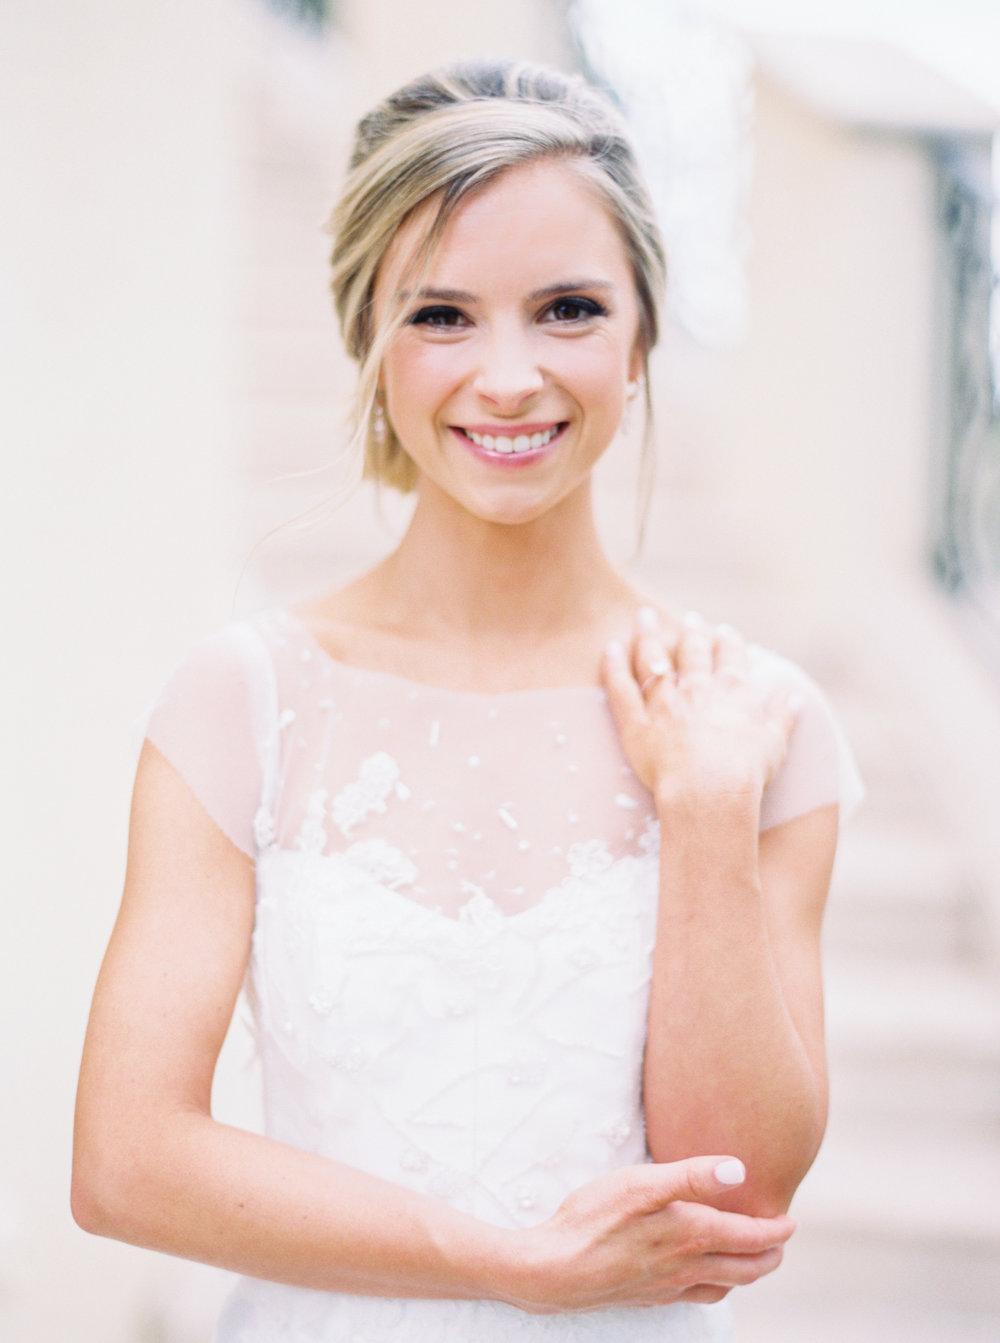 jenna-mcelroy-bridal-portraits-a-southern-tradition-7